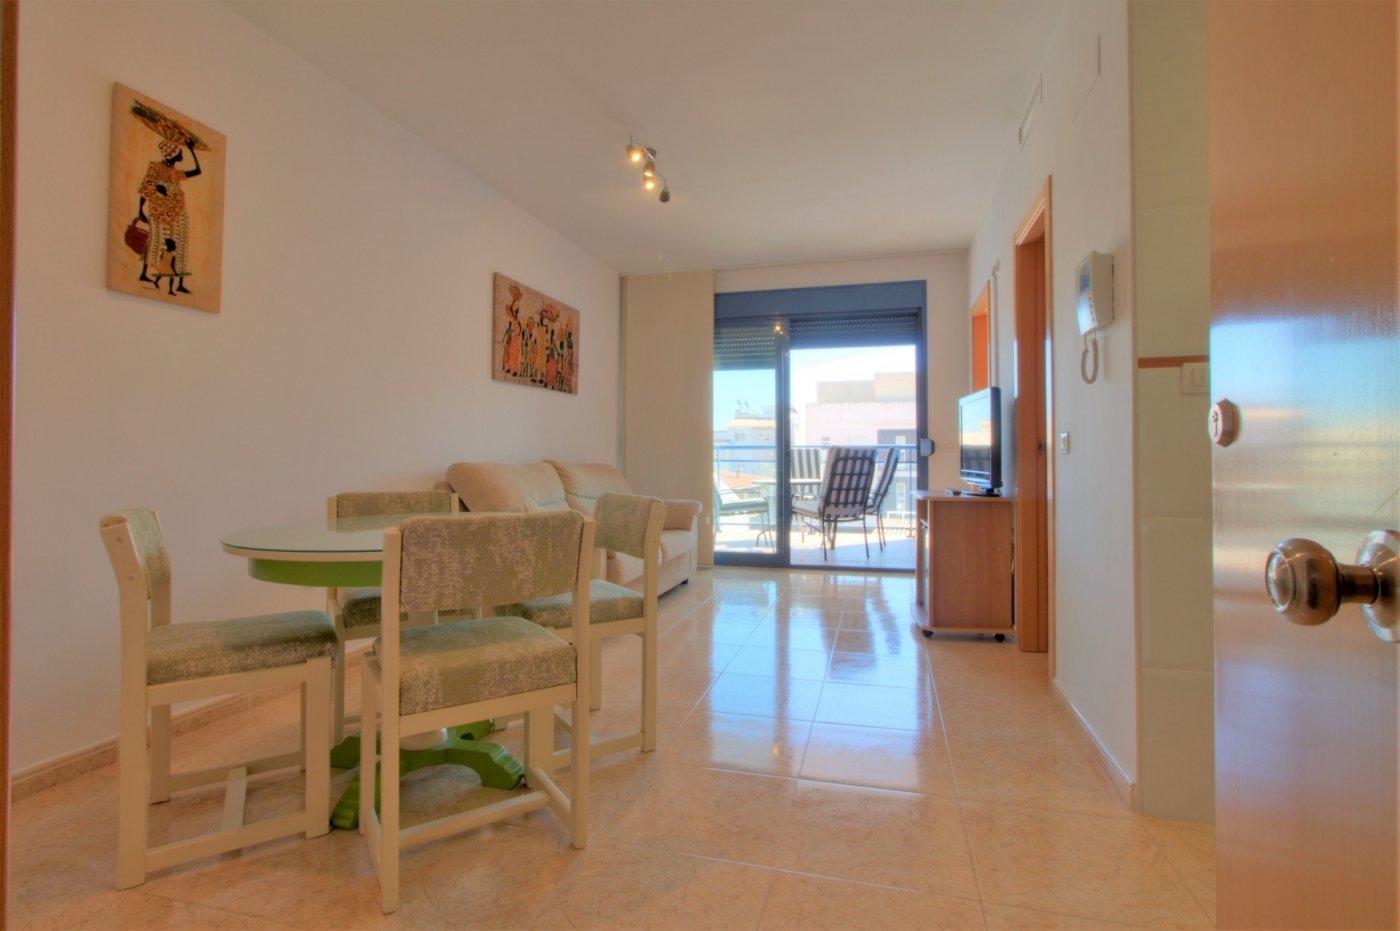 Lloguer Pis  Calle gravina, 25. Apartamento de una habitación en playa de Chilches